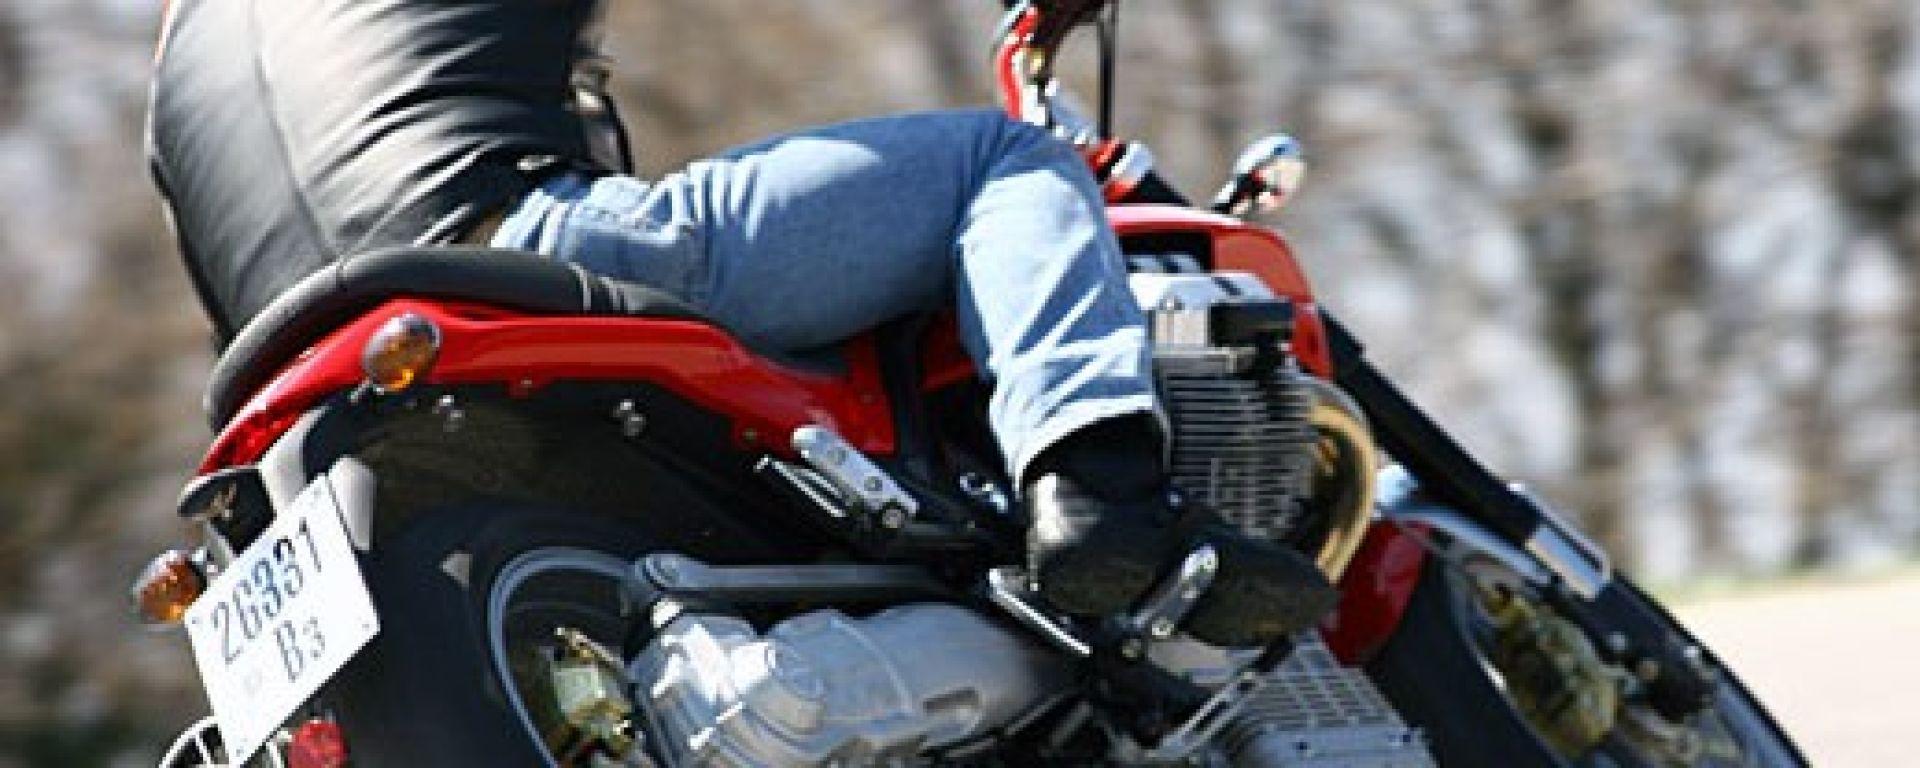 Moto Guzzi Breva & Griso 850